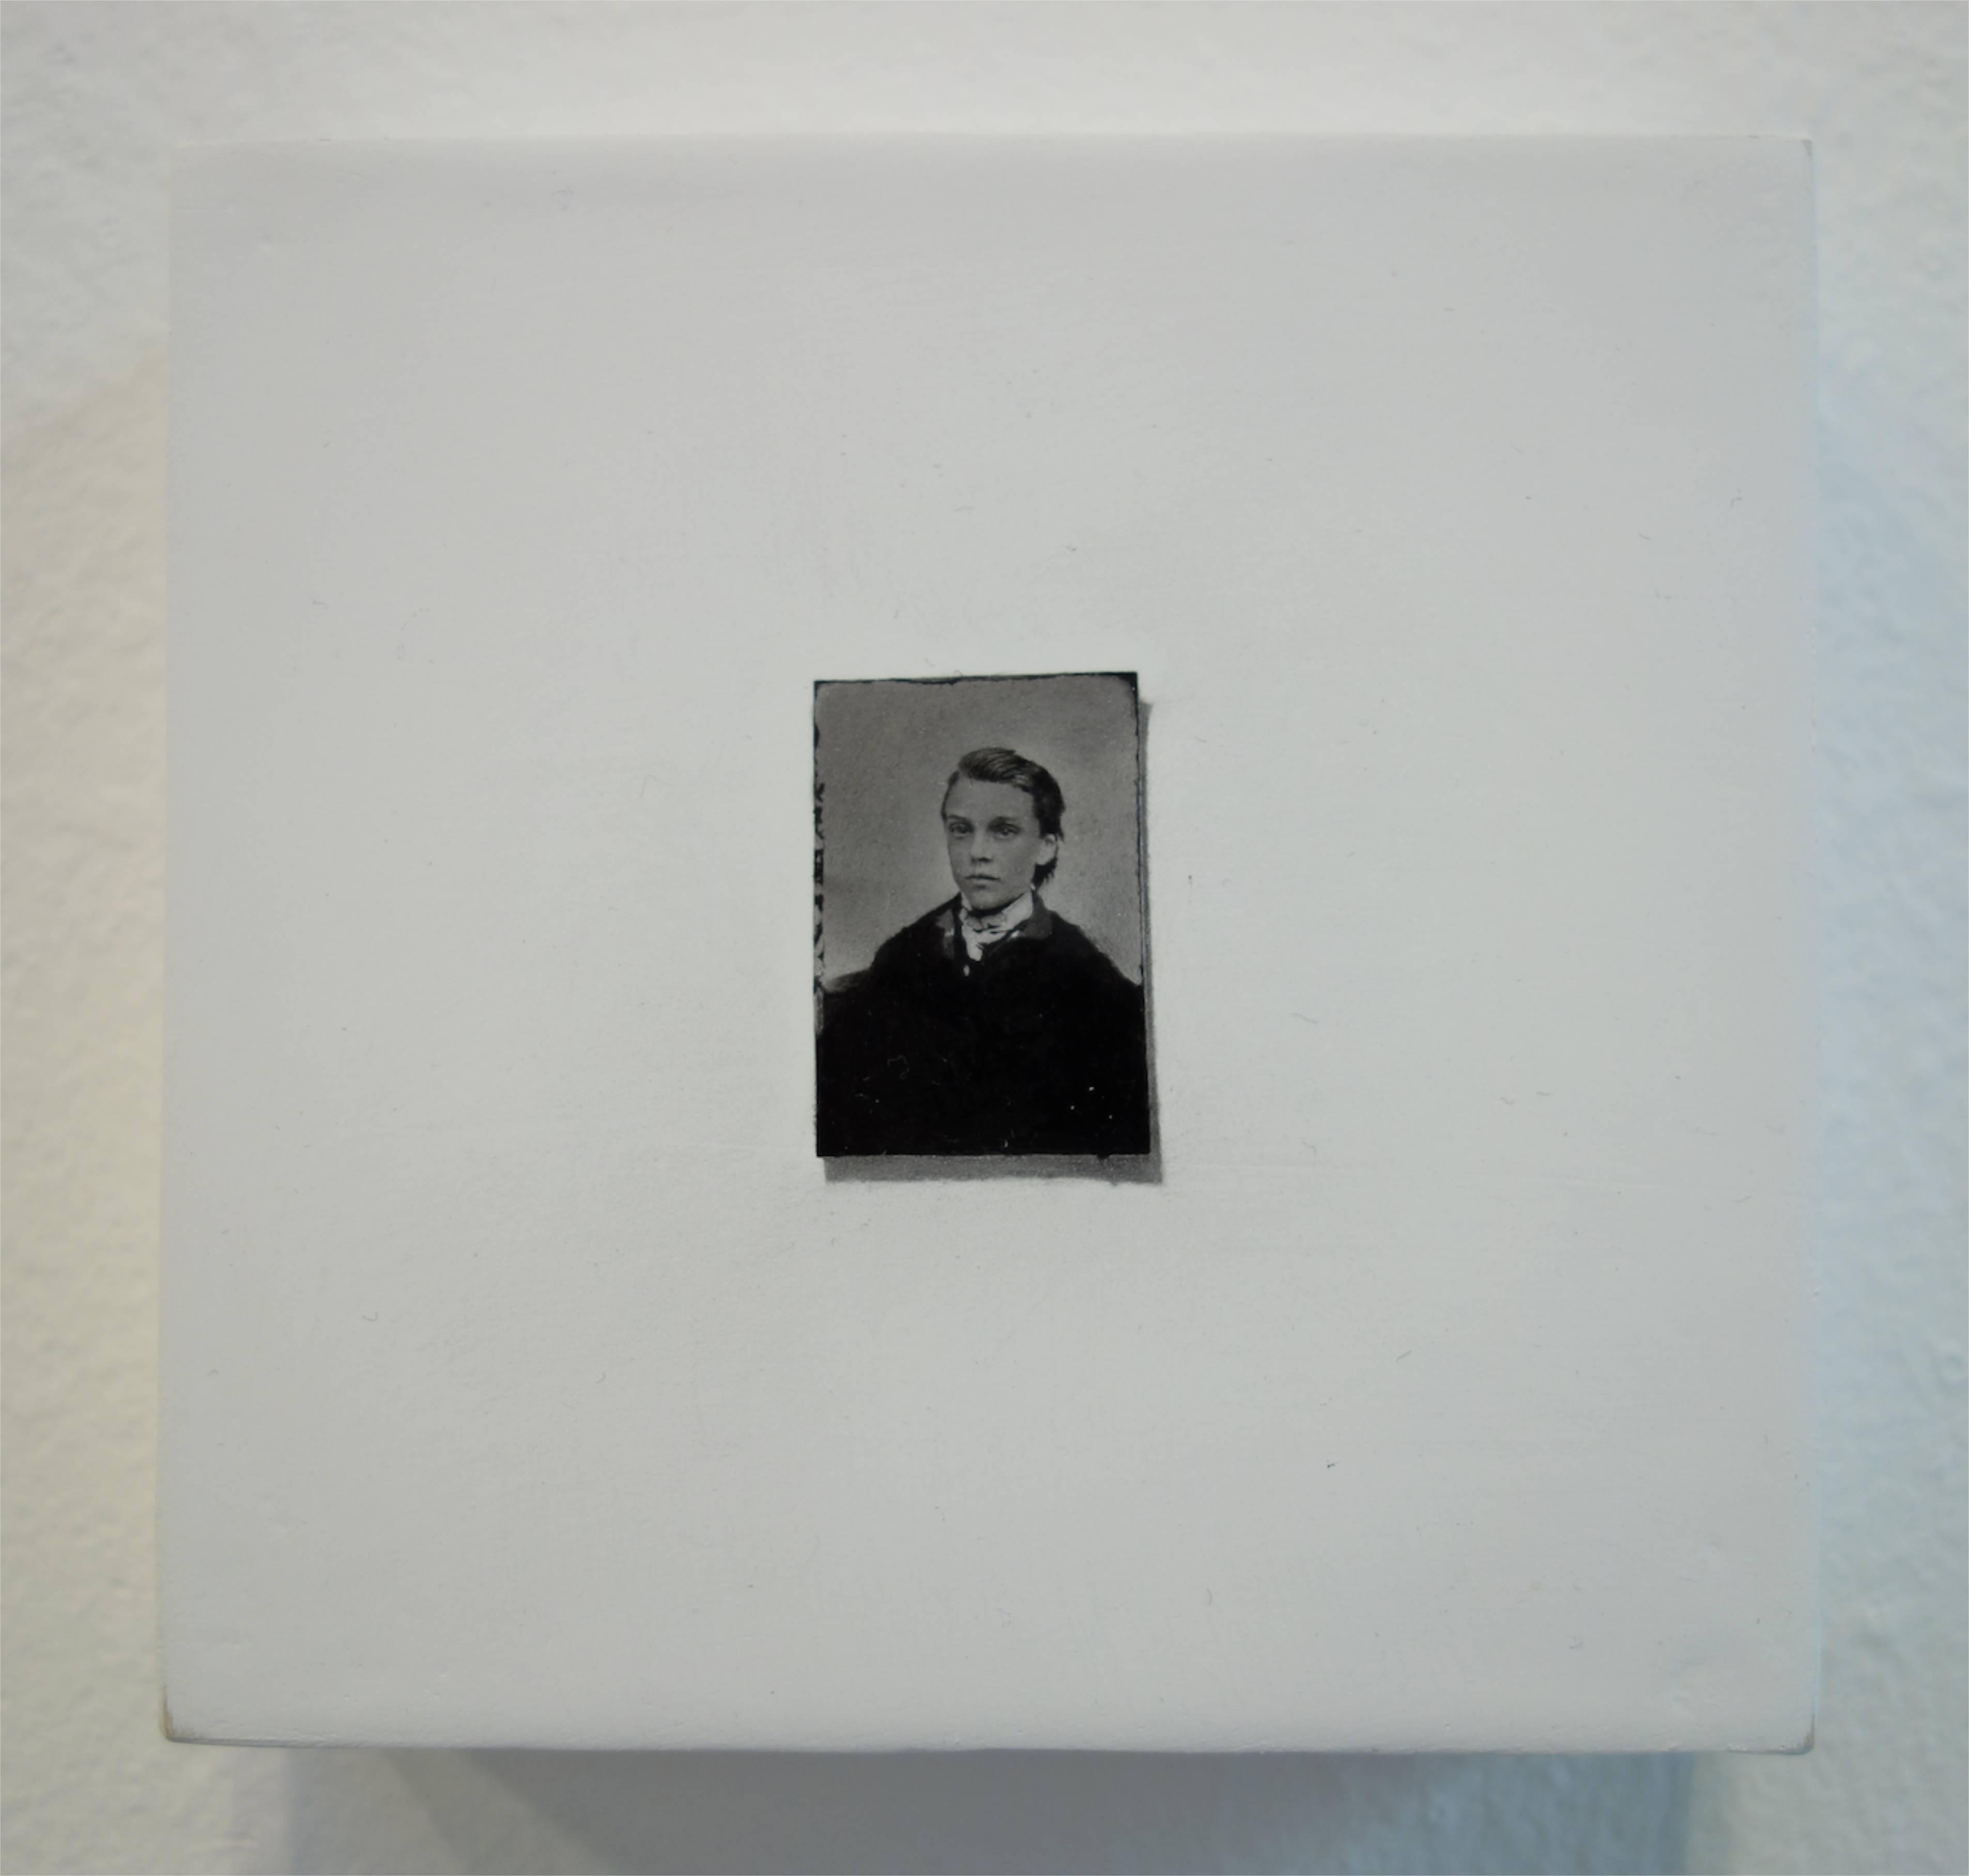 Takahiro Yamamoto, 'Reannotation', 2016, Oil and pencil on board, 10 x 10 cm, Gallery Kogure (Japan / USA)